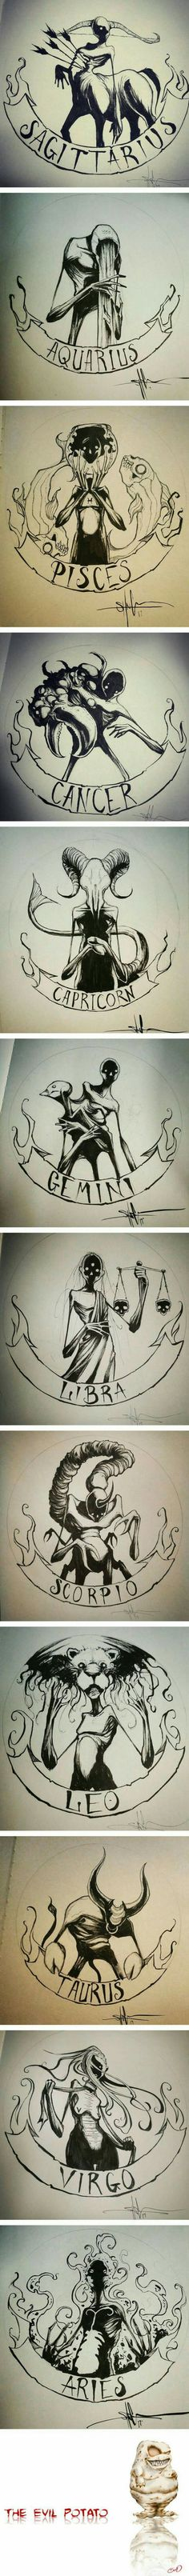 Zodiac signs as creepy monsters cancer zodiac art, sagittarius art, capricorn tattoo, taurus Art Zodiaque, Creepy Monster, Arte Horror, Creepy Art, Drawing Eyes, Cool Drawings, Creepy Drawings, Creepy Tattoos, Creepy Sketches